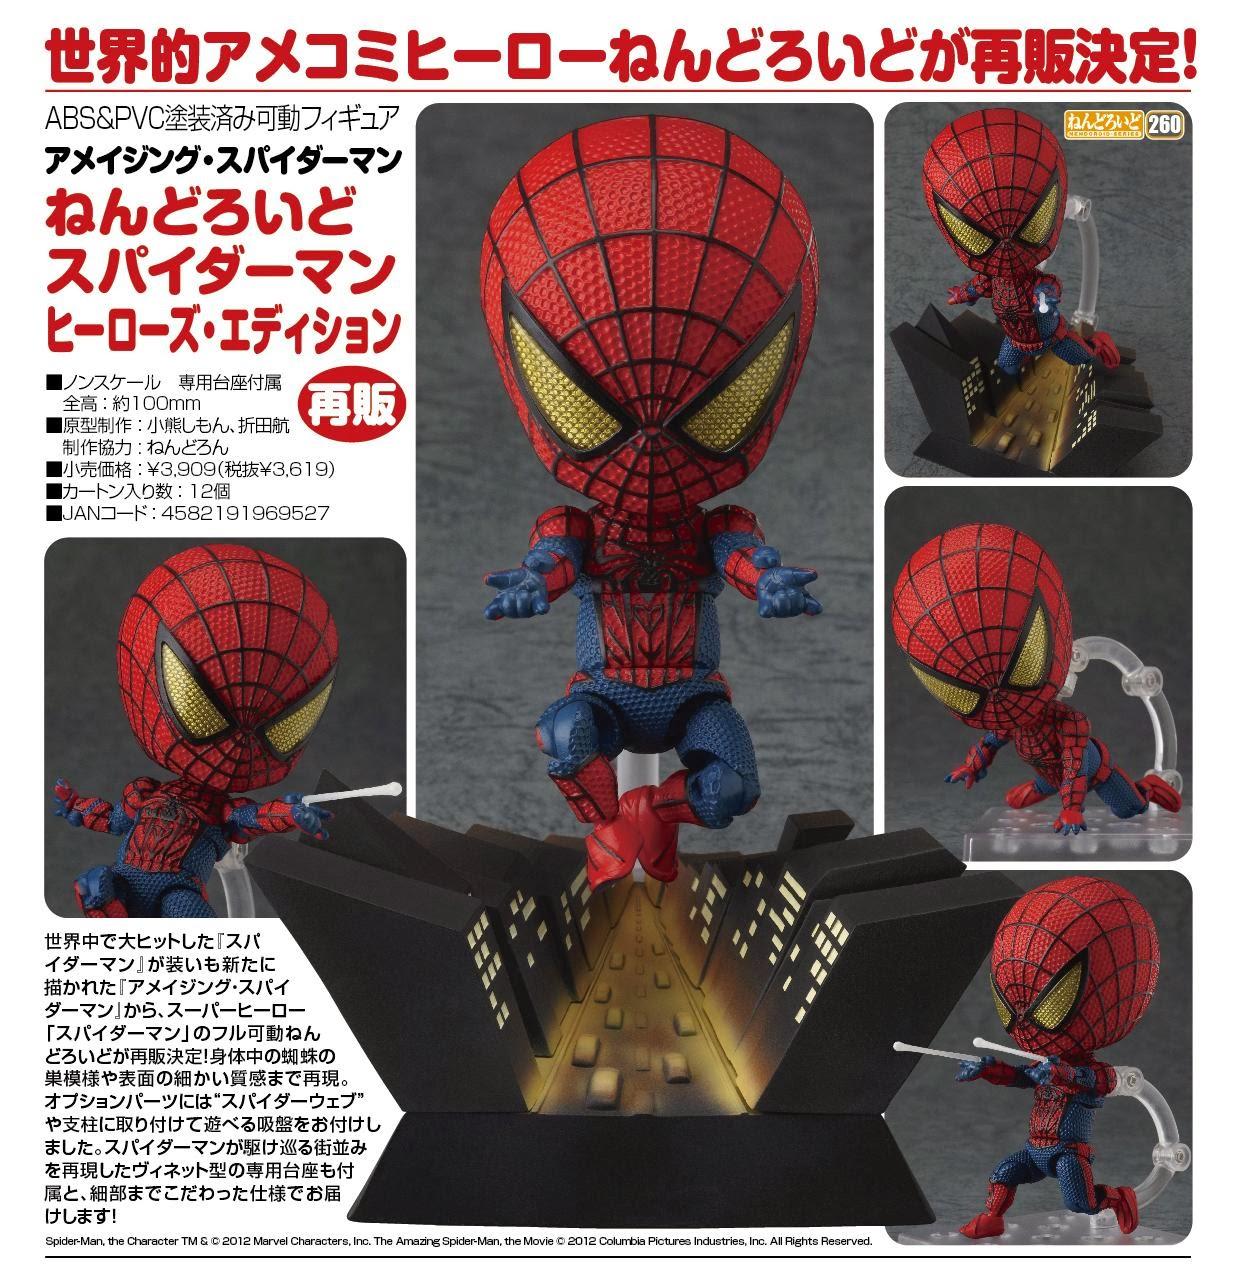 http://www.shopncsx.com/nendoroidspider-manherosedition-japanpreorder.aspx